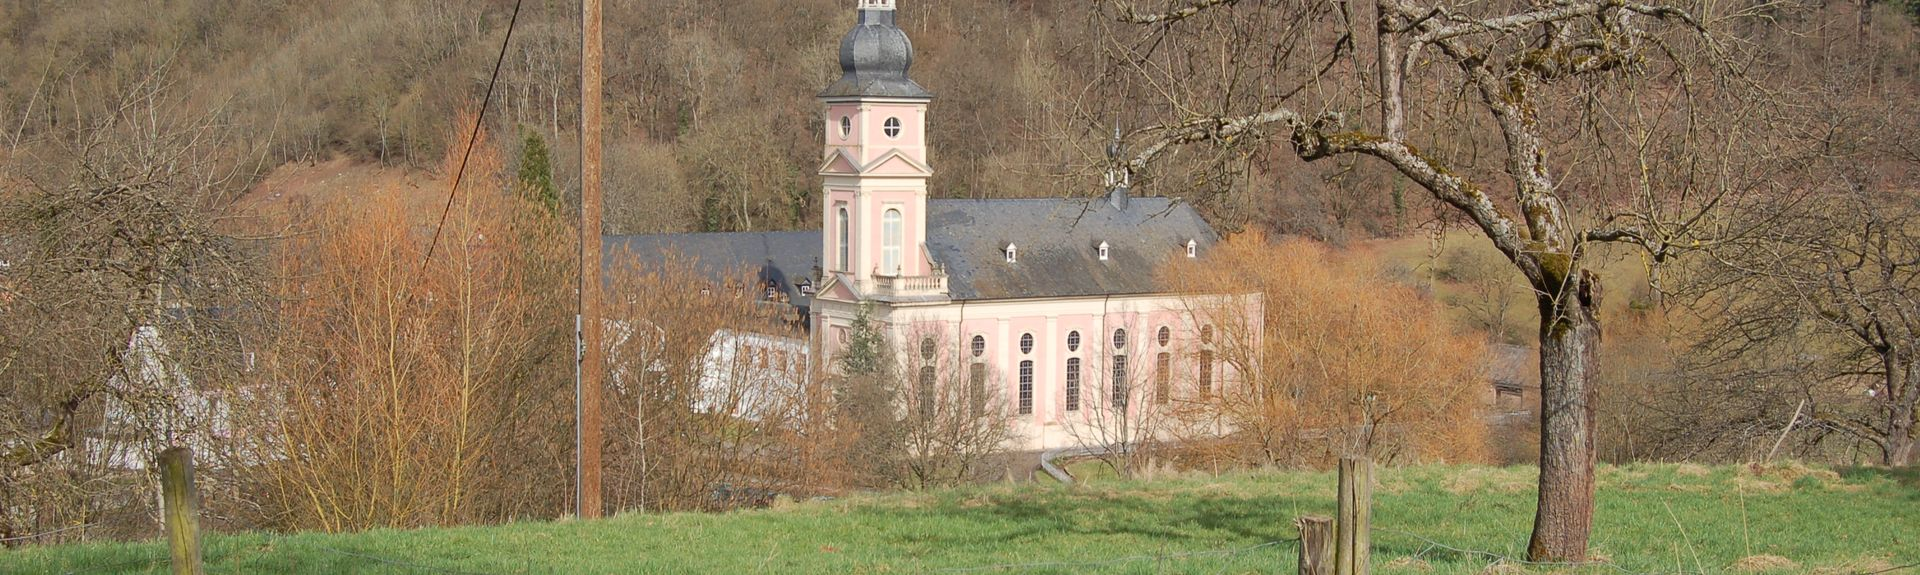 Mülheim (Moselle), Rhineland-Palatinate, Germany